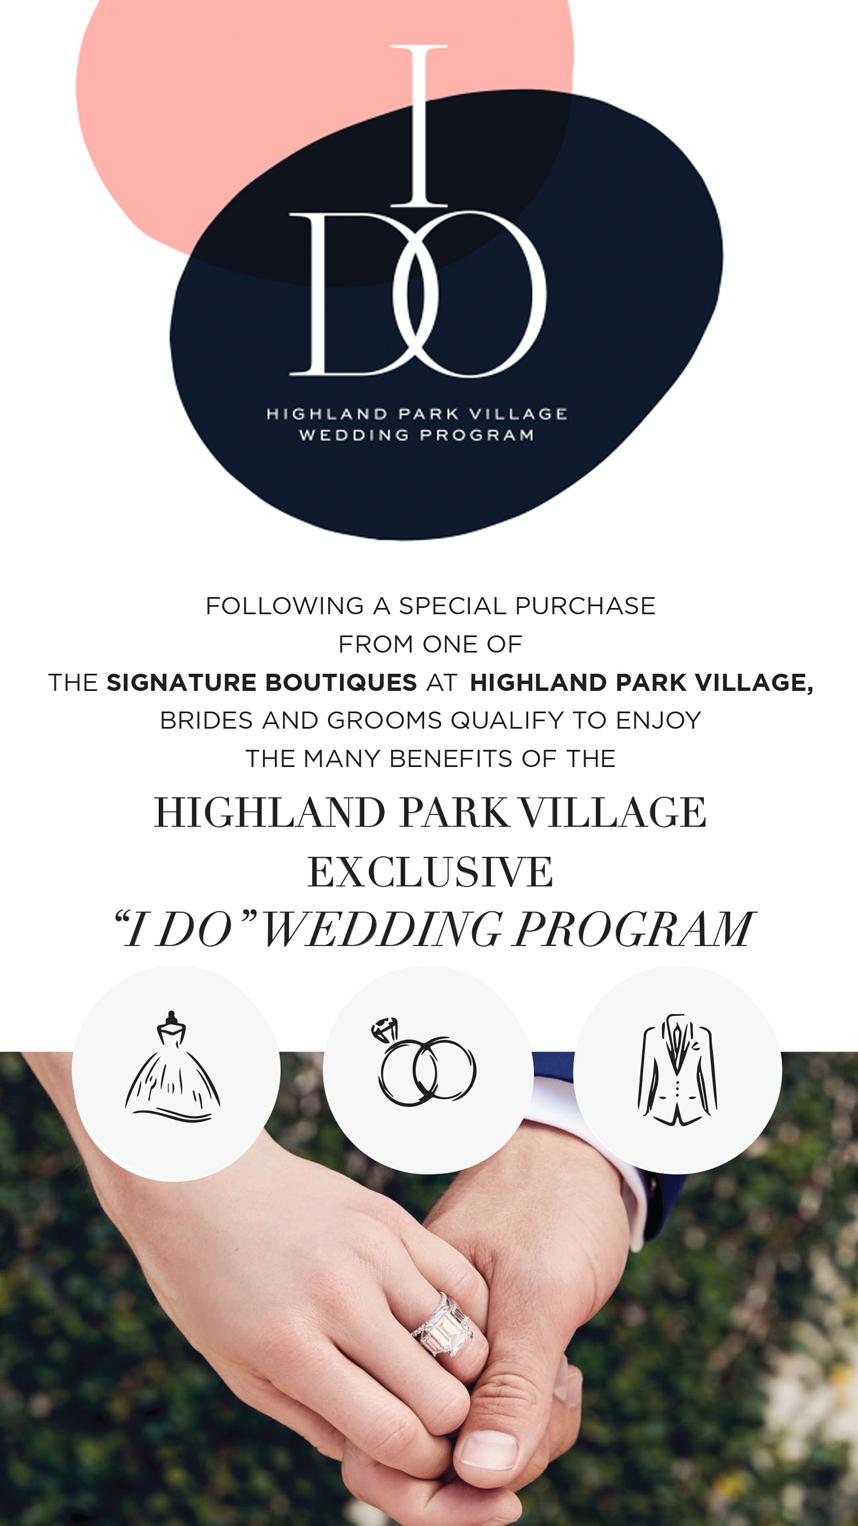 highland park village i do program